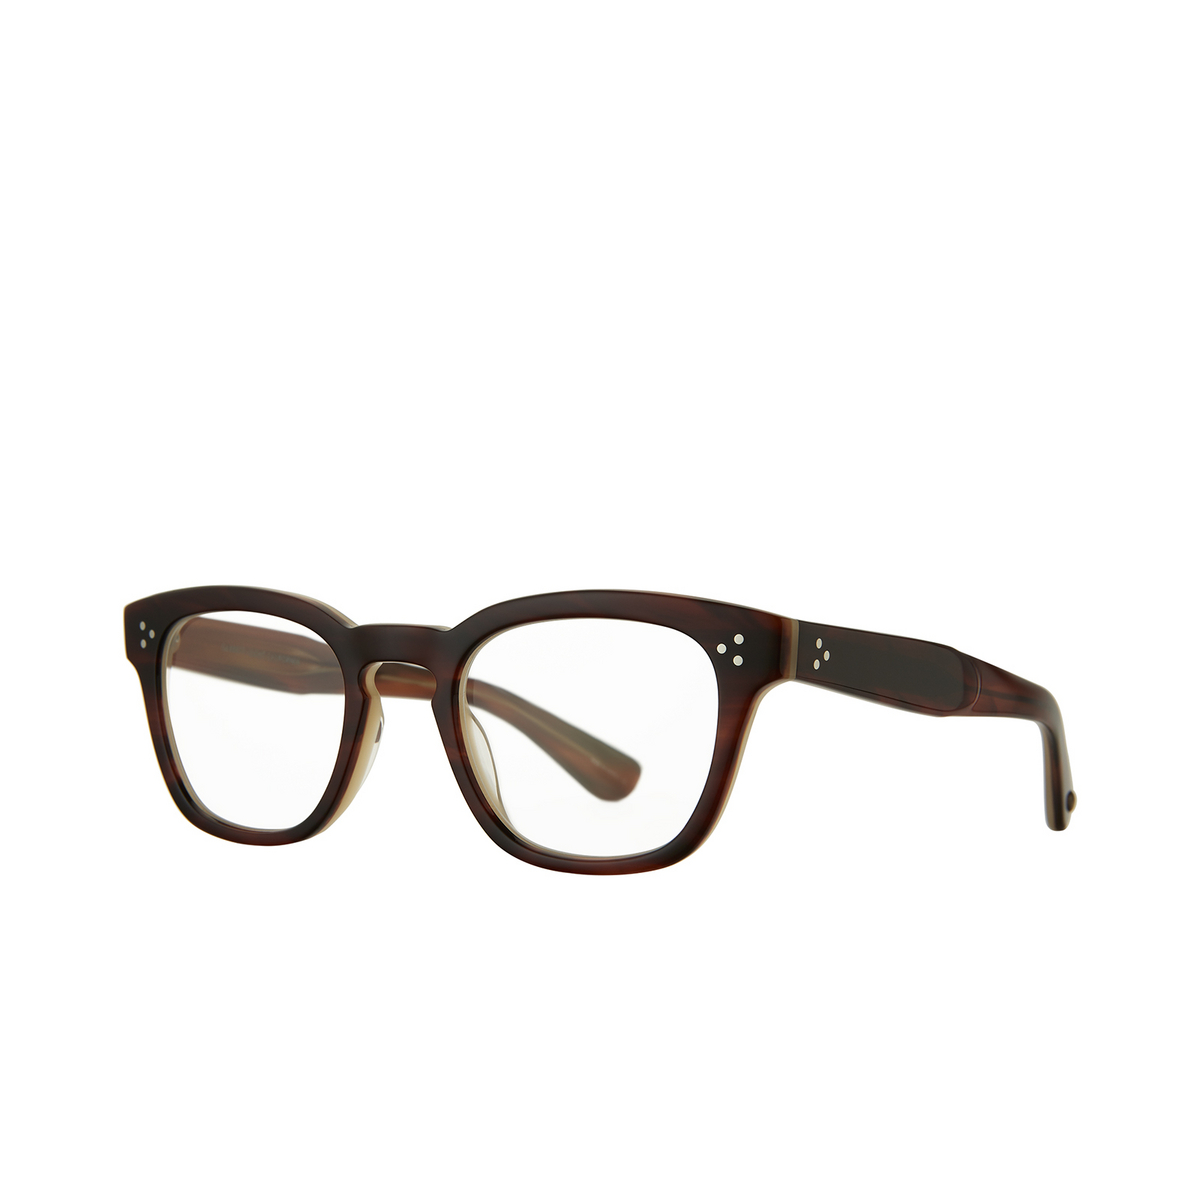 Garrett Leight® Square Eyeglasses: Regent color Whiskey Tortoise Wht - three-quarters view.